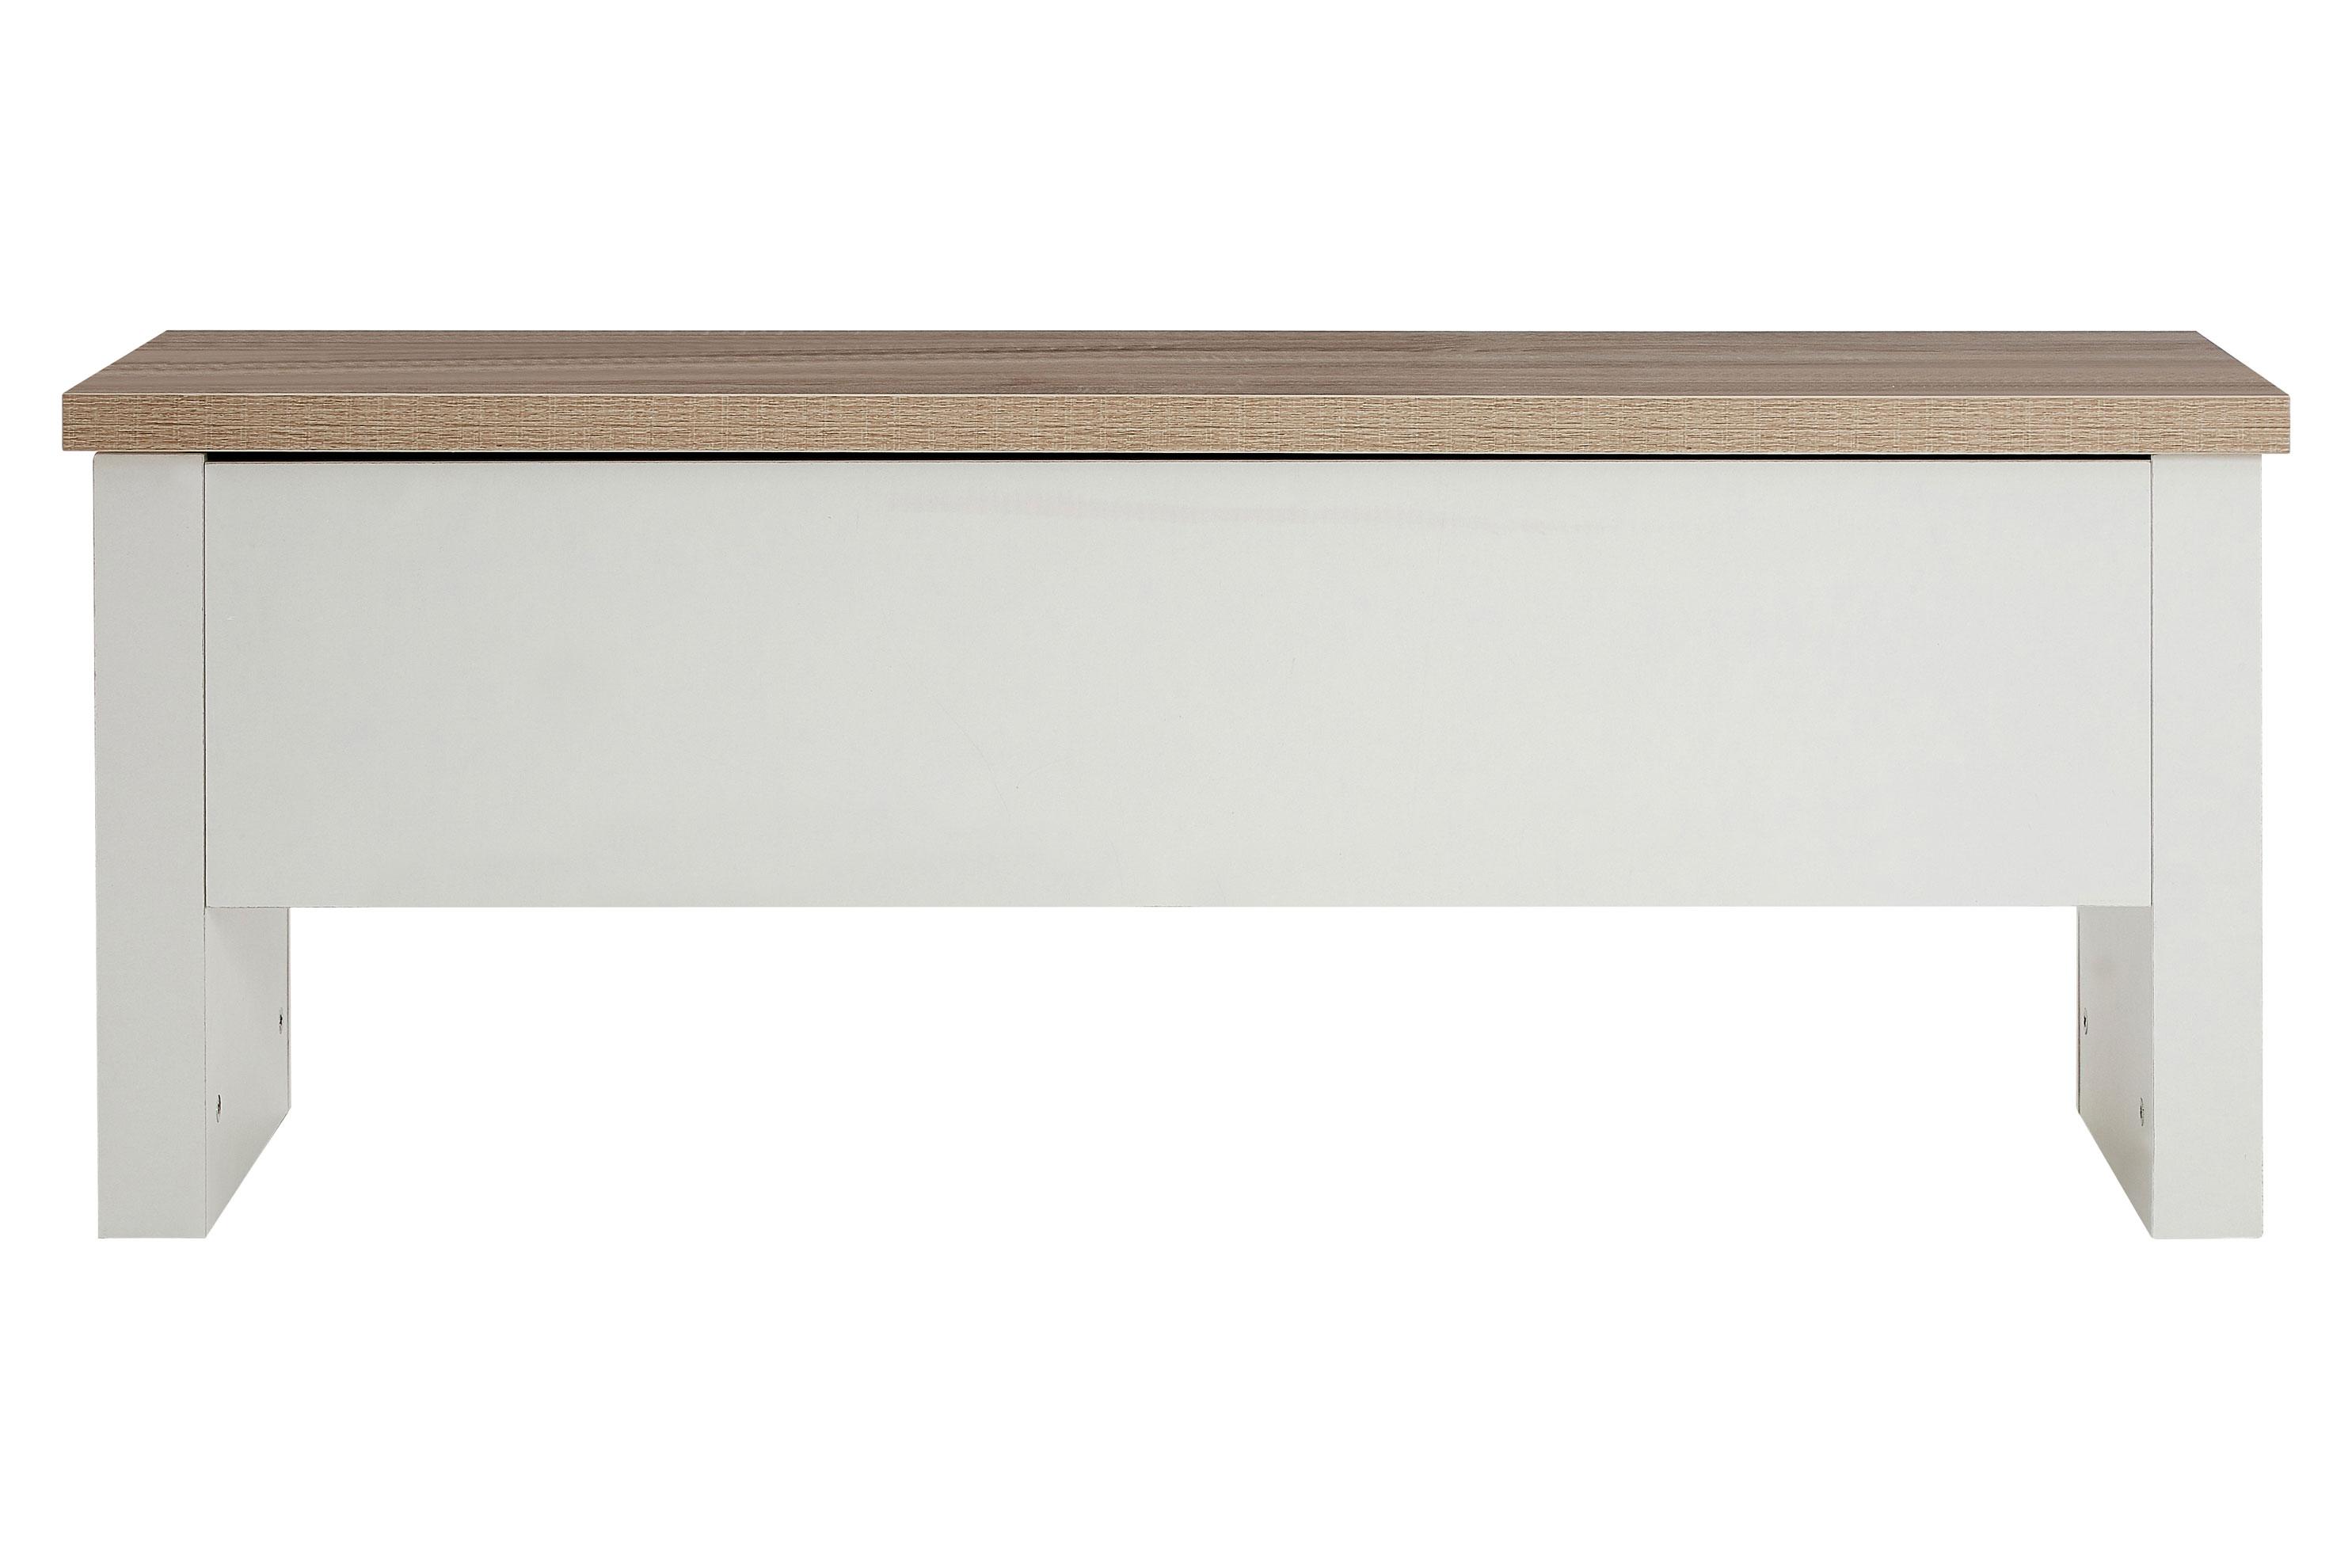 St ives storage ottoman bench oak veneer white finish for Oak ottoman storage